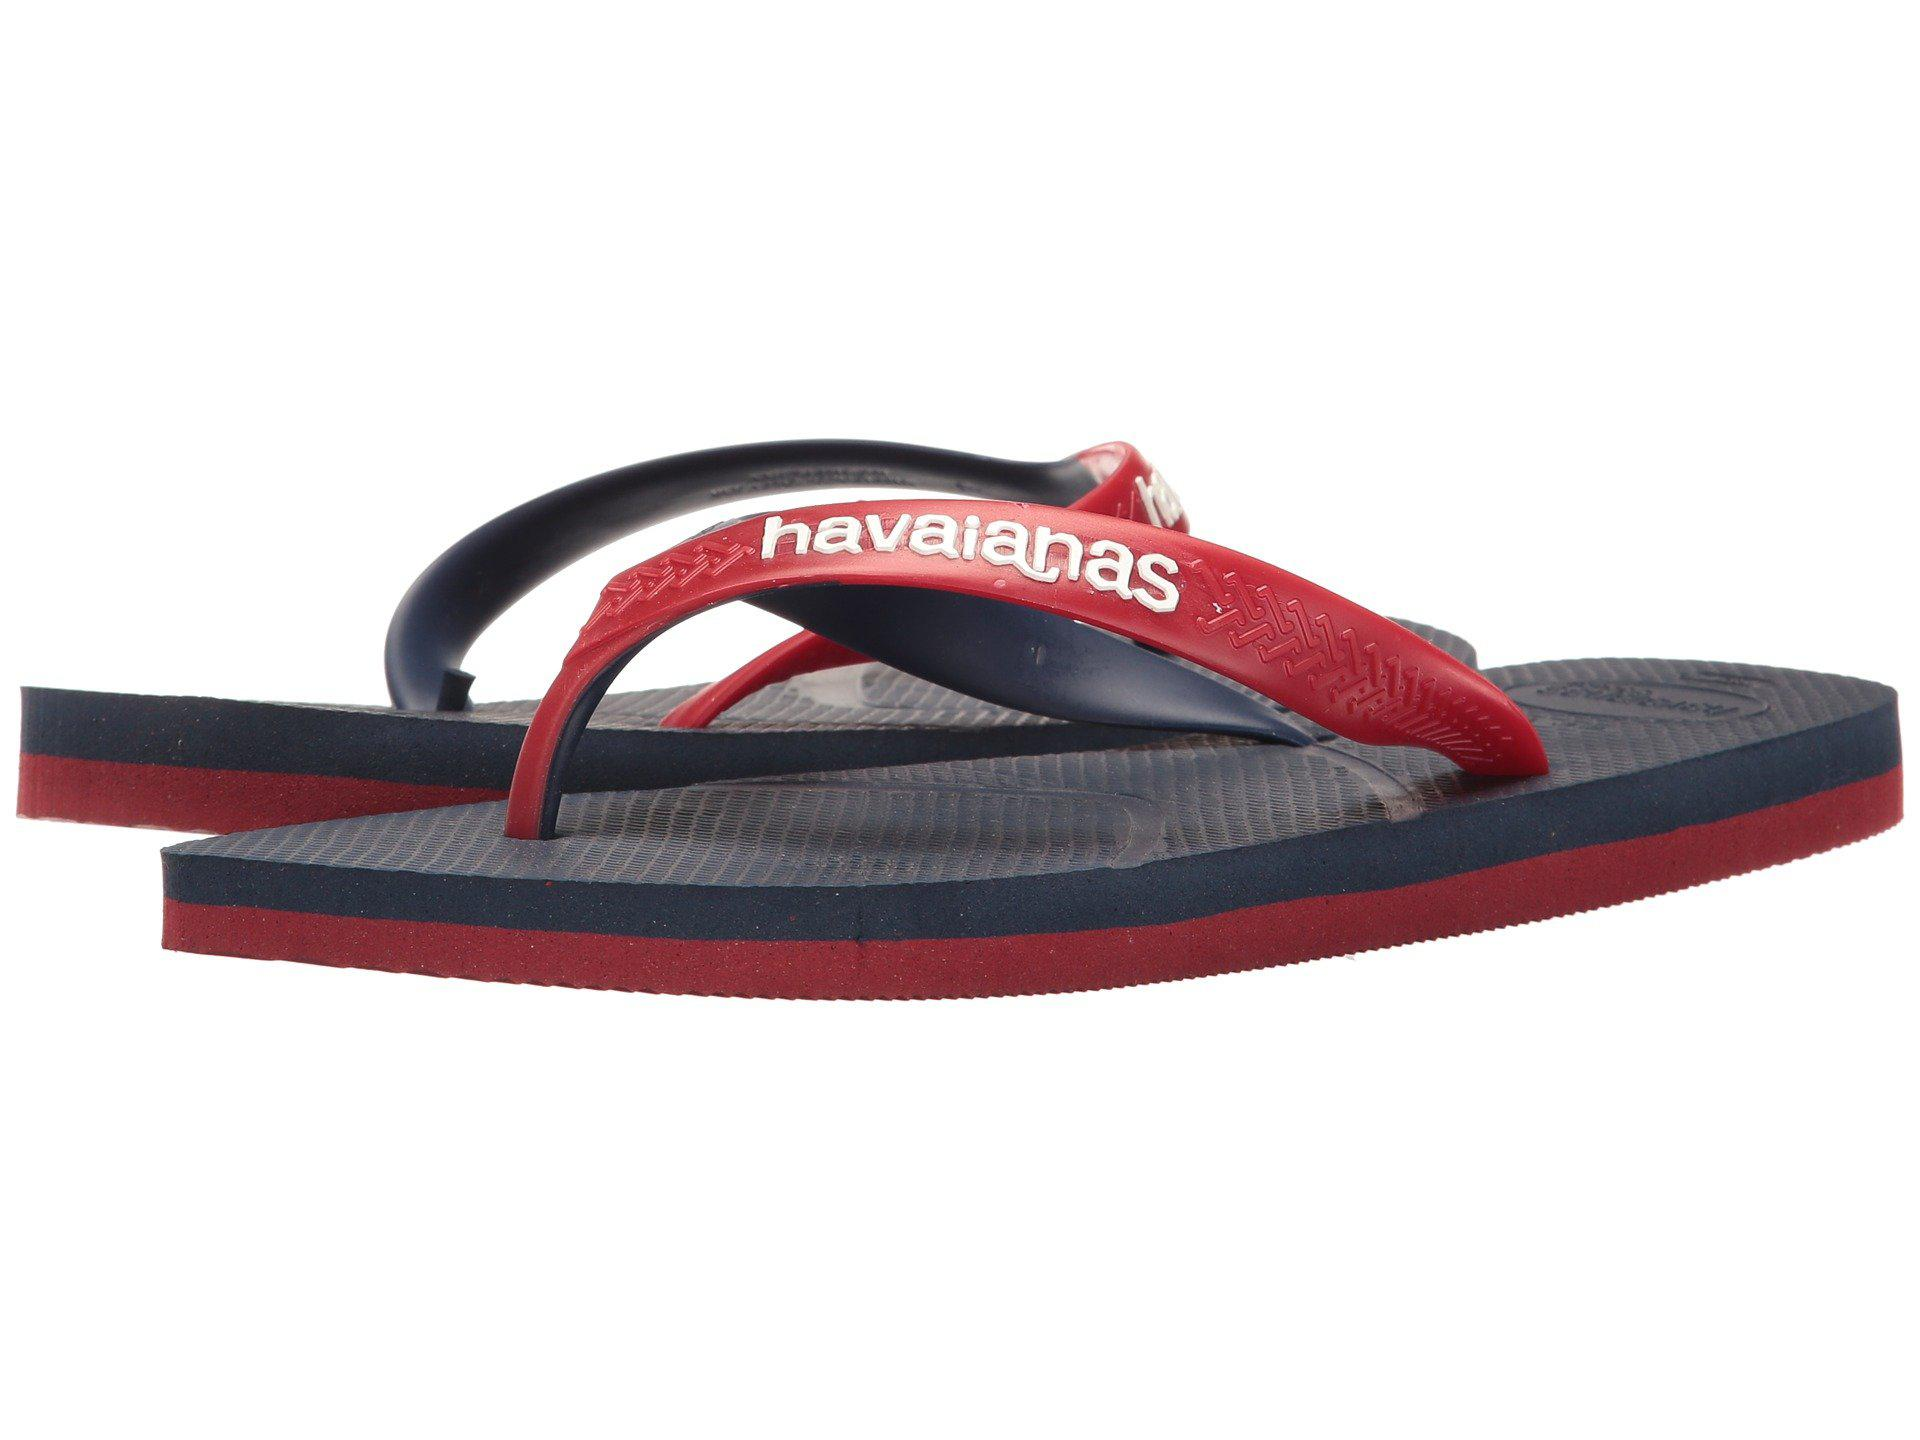 0dae8f684bff61 Lyst - Havaianas Casual Flip Flops (steel Grey black) Men s Sandals ...